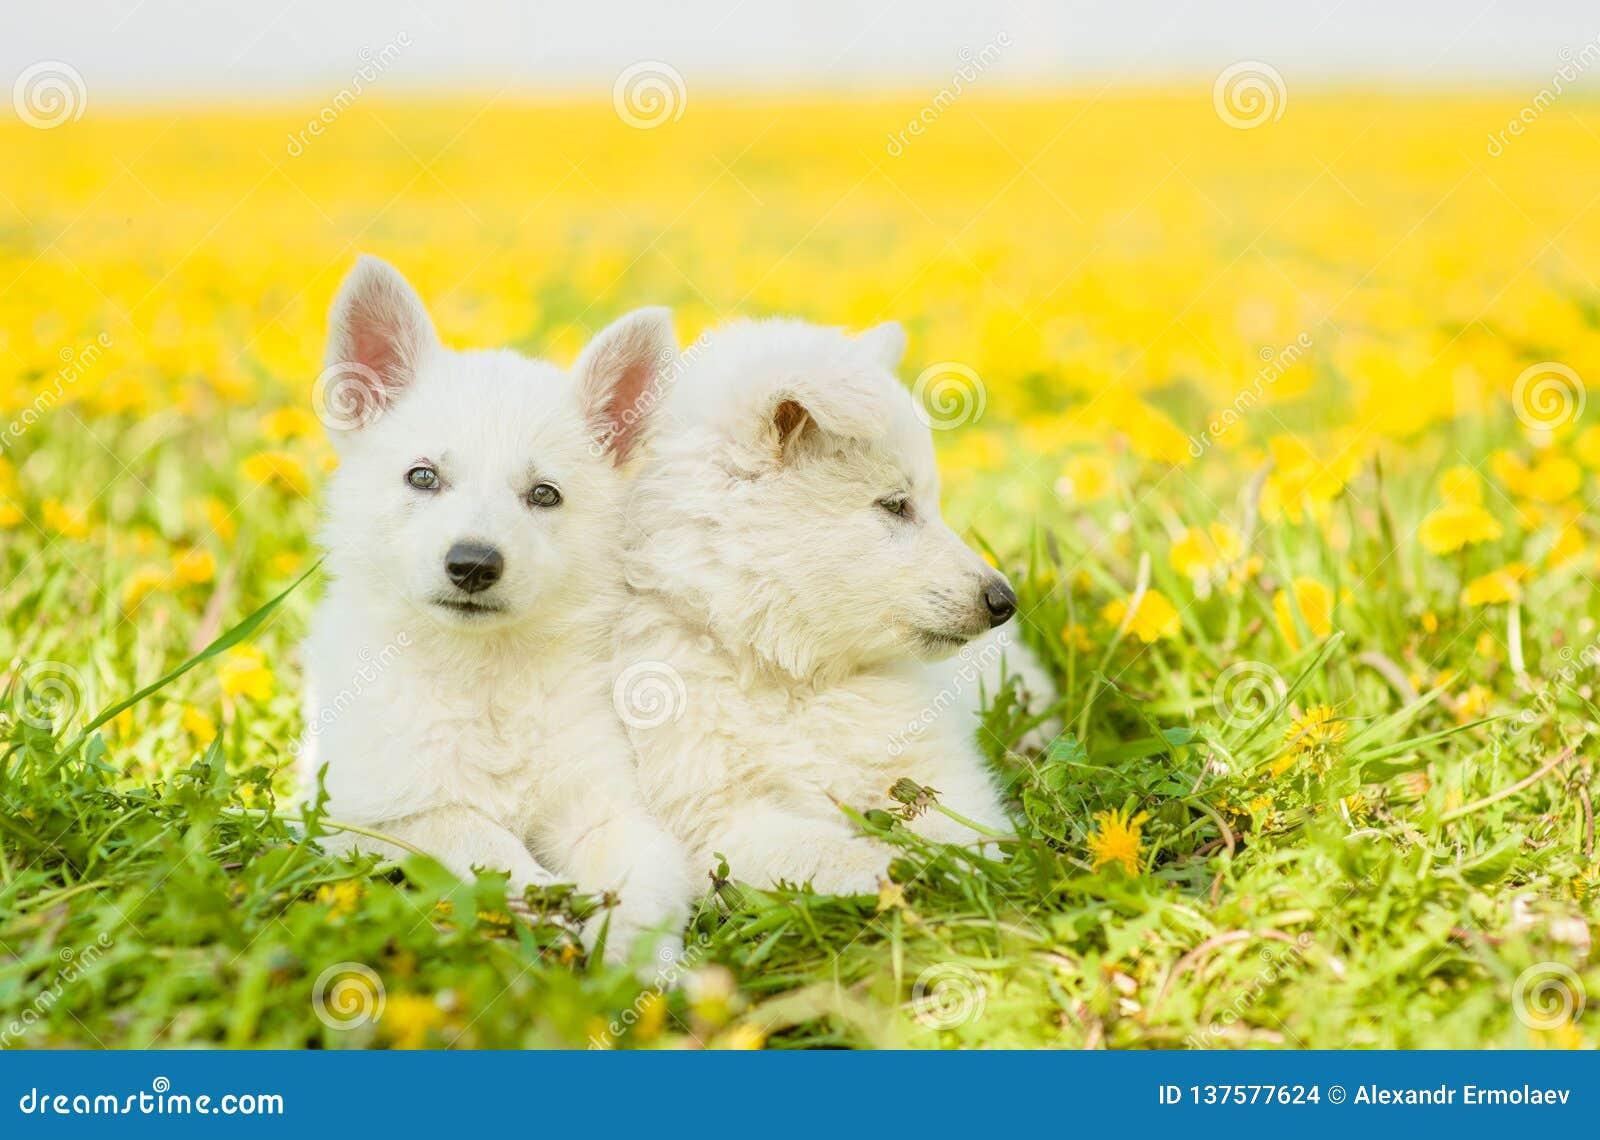 Two White Swiss Shepherd`s puppies lying on dandelion field together